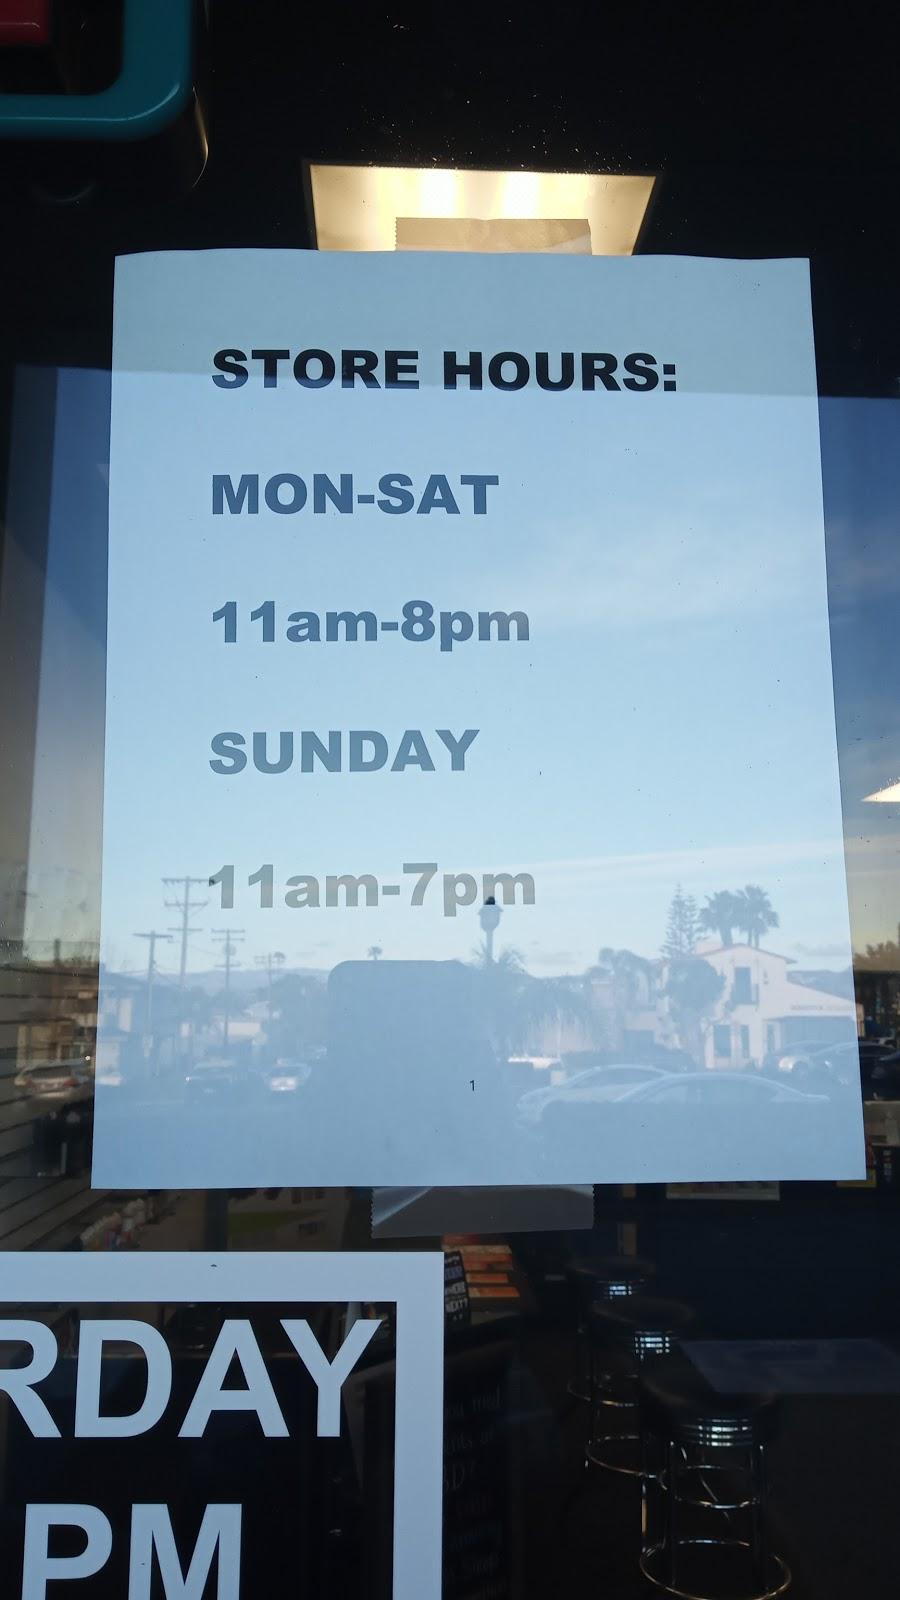 South County Vapors & CBD Dana Point - store  | Photo 7 of 10 | Address: 34085 CA-1 #102, Dana Point, CA 92629, USA | Phone: (949) 503-1590